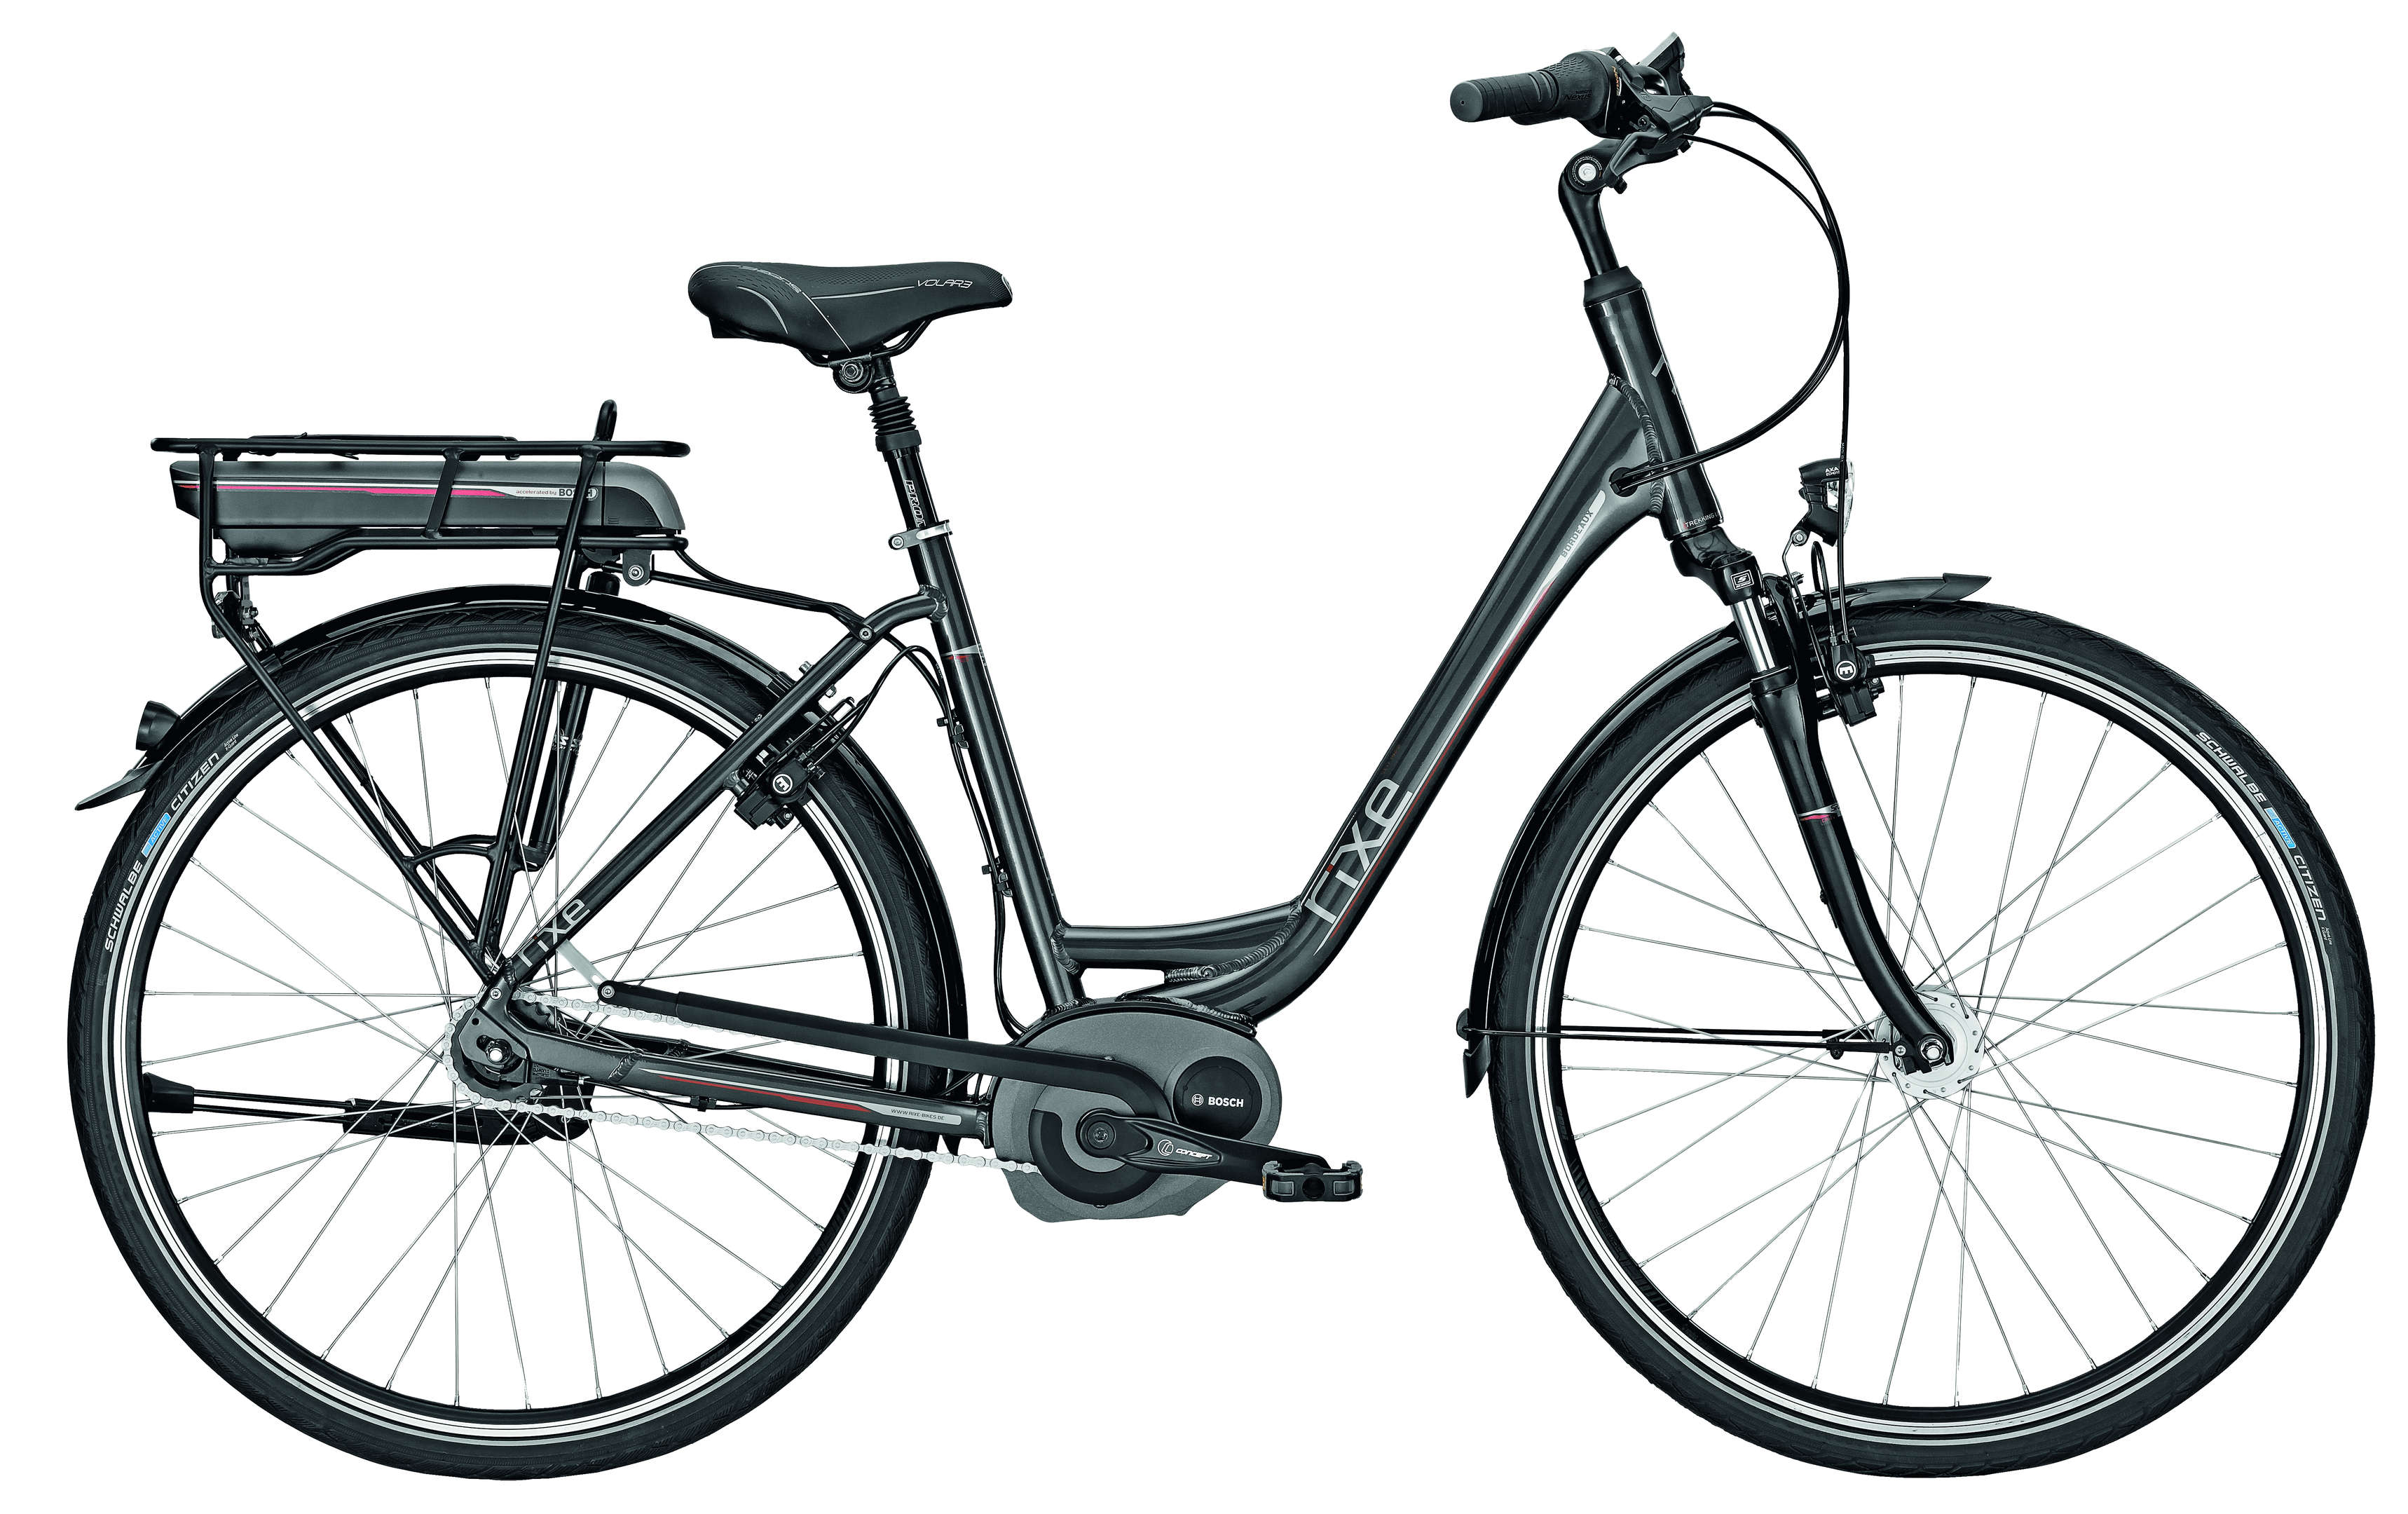 rixe e bike bordeaux b7 hs eurorad bikeleasingeurorad. Black Bedroom Furniture Sets. Home Design Ideas